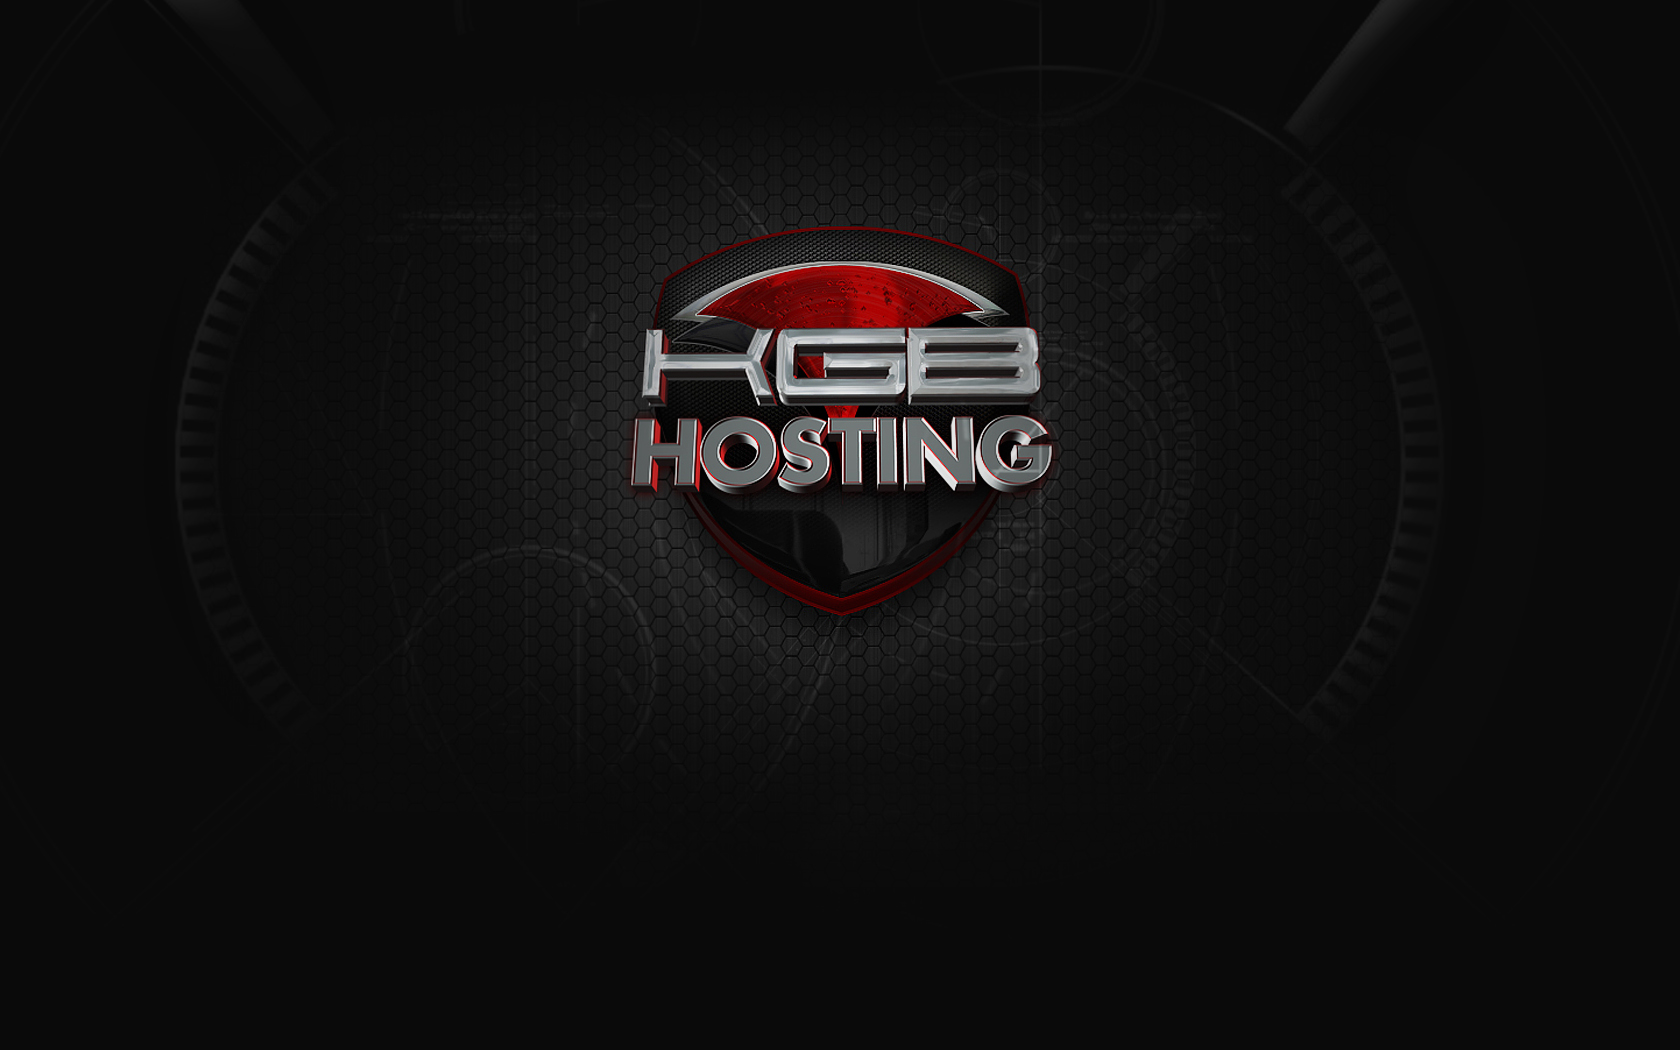 Kgb Hosting